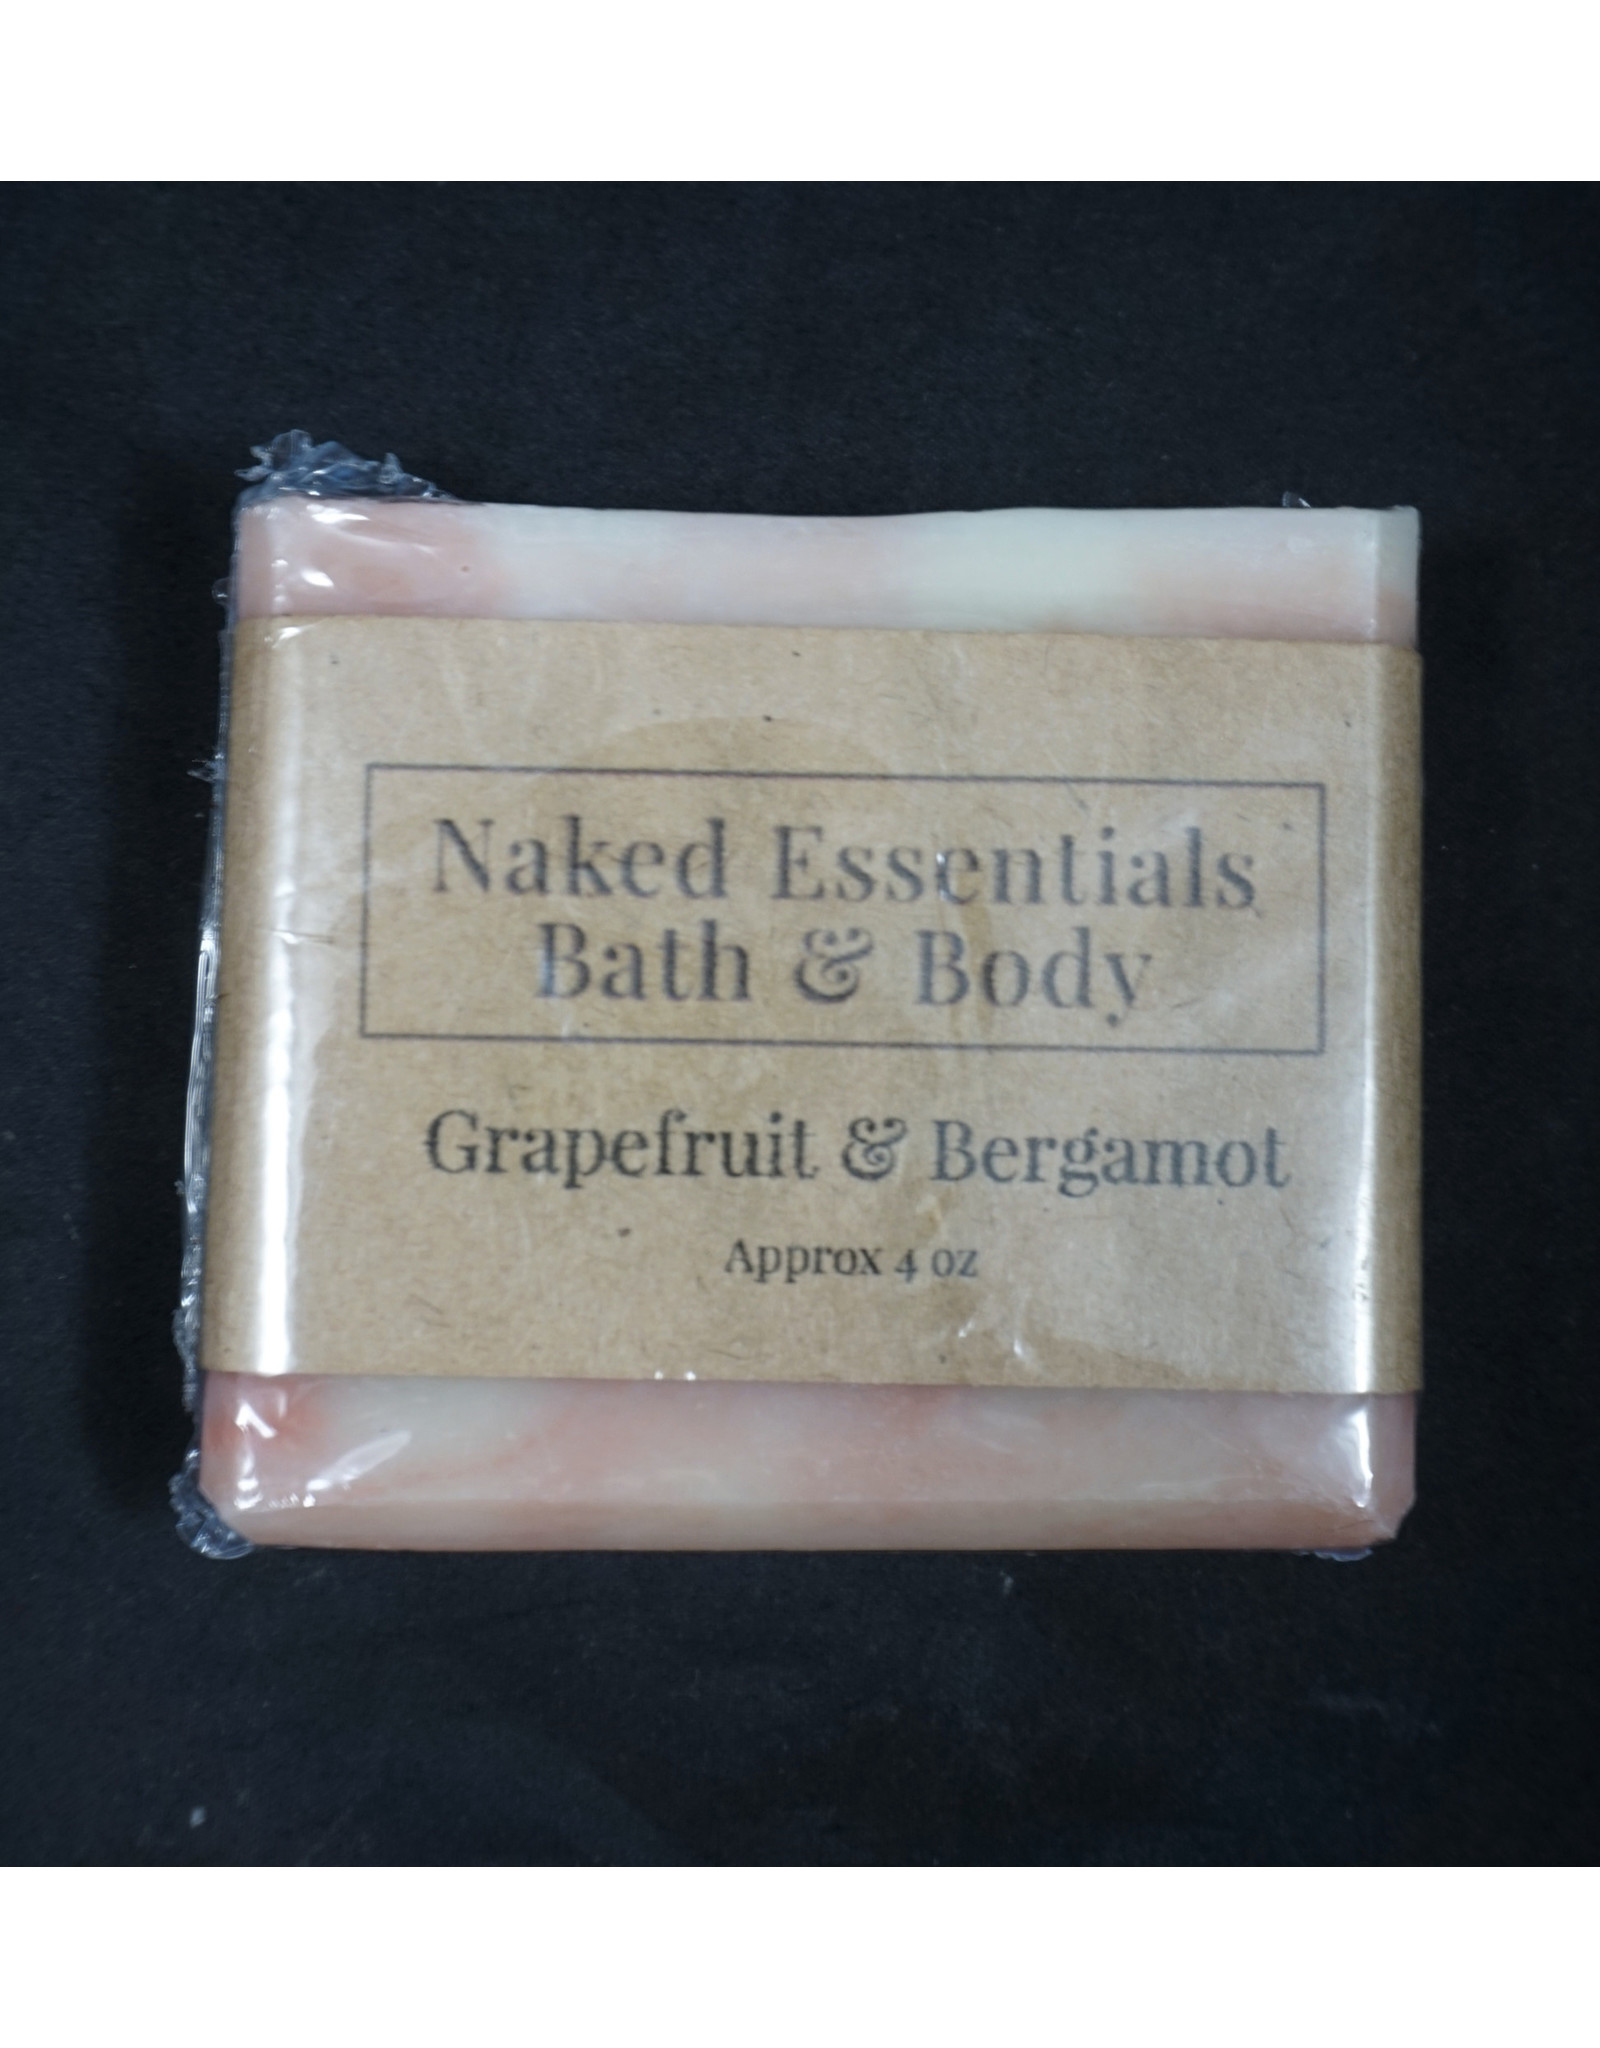 Naked Essentials Naked Essentials - Grapefruit Bergamot